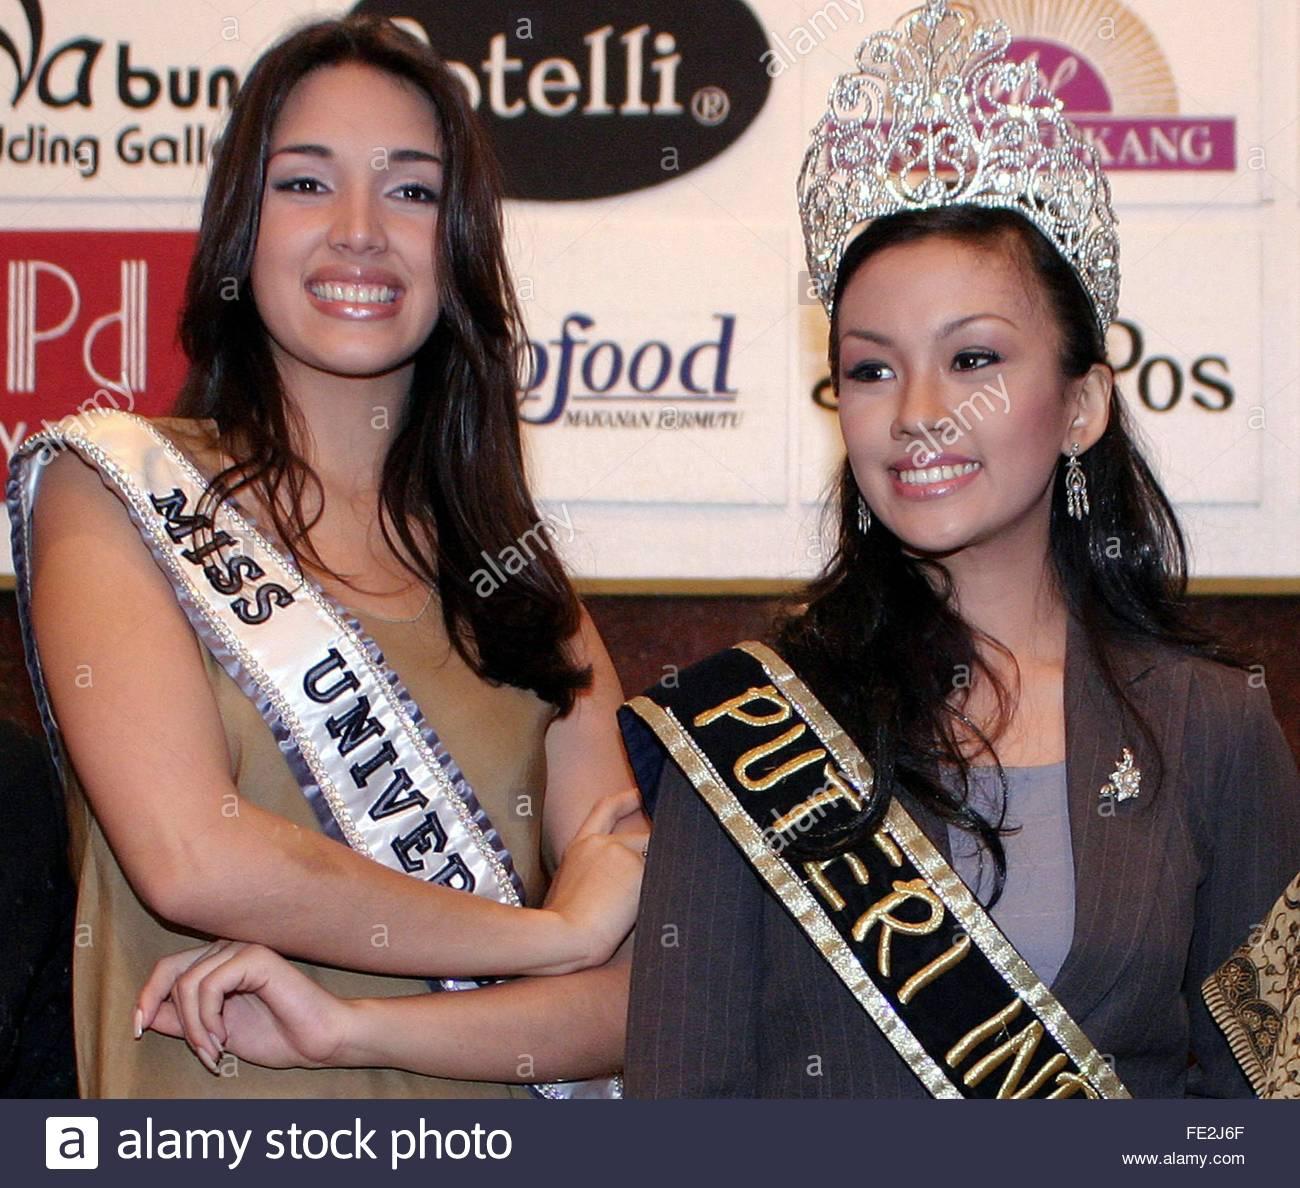 ════ ∘◦❁◦∘ ════ Amelia Vega, Miss Universe 2003. ════ ∘◦❁◦∘ ════ - Página 8 Newly-11